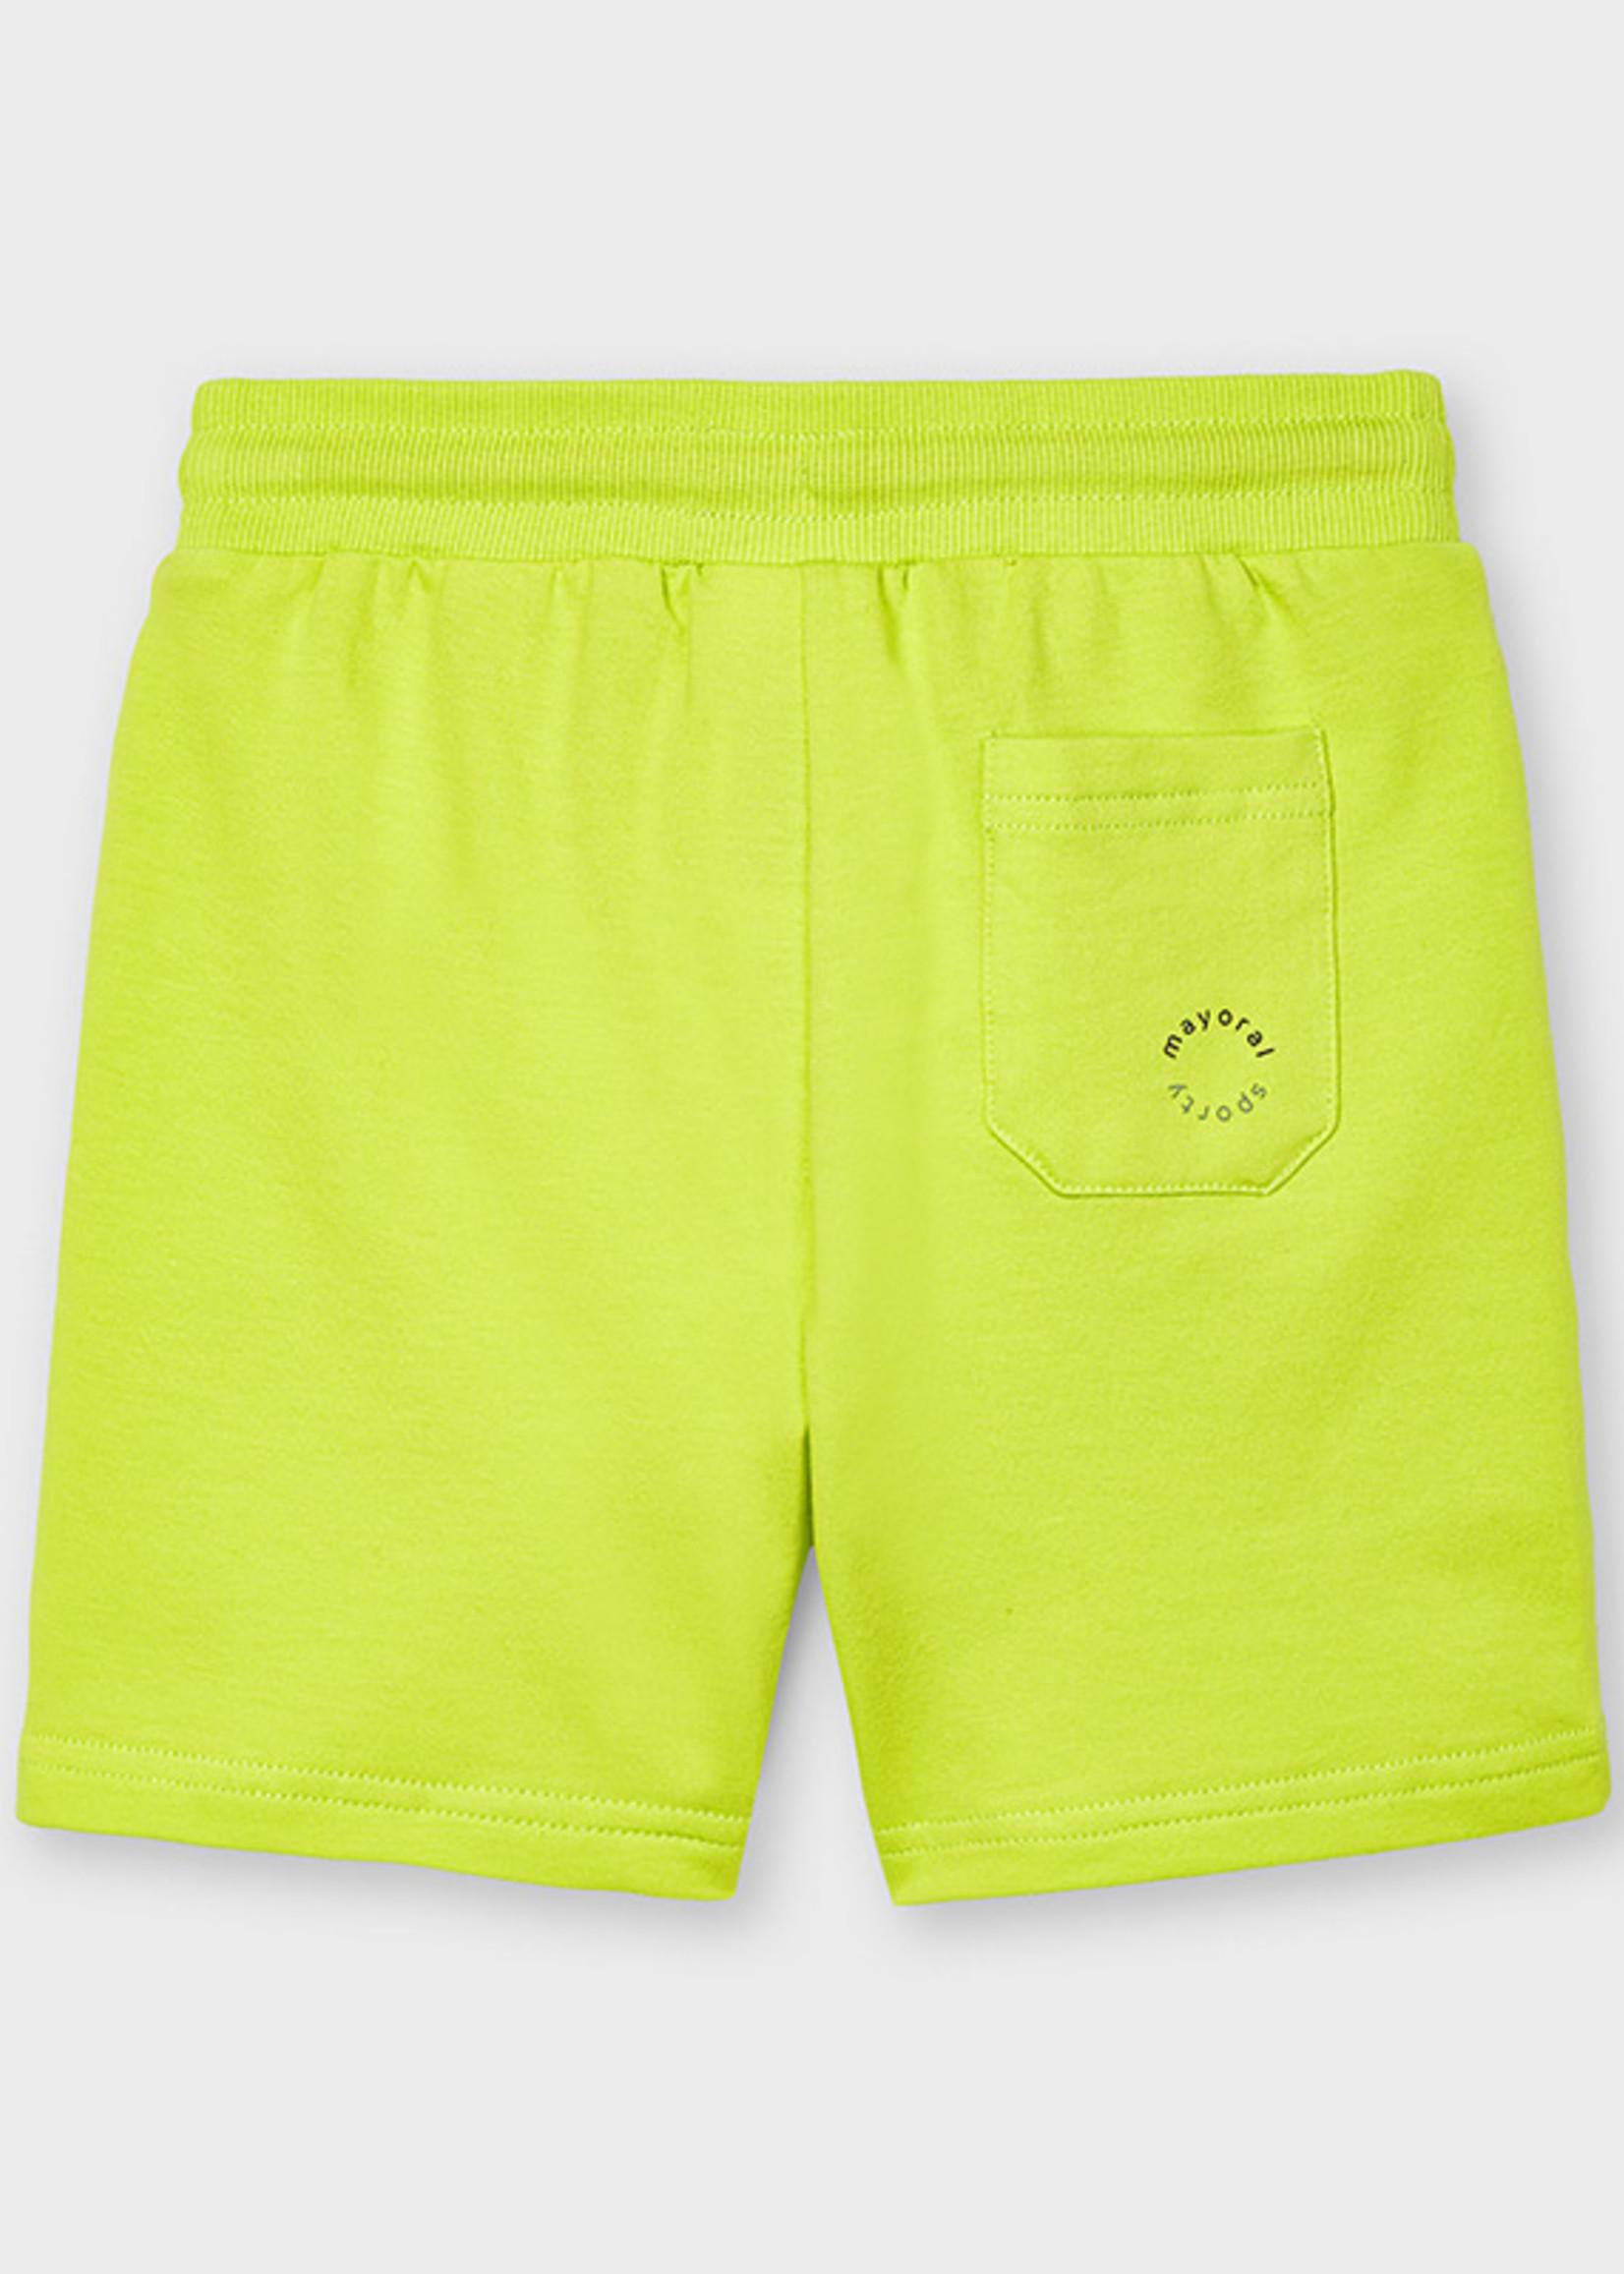 Mayoral Mayoral Basic fleece shorts green